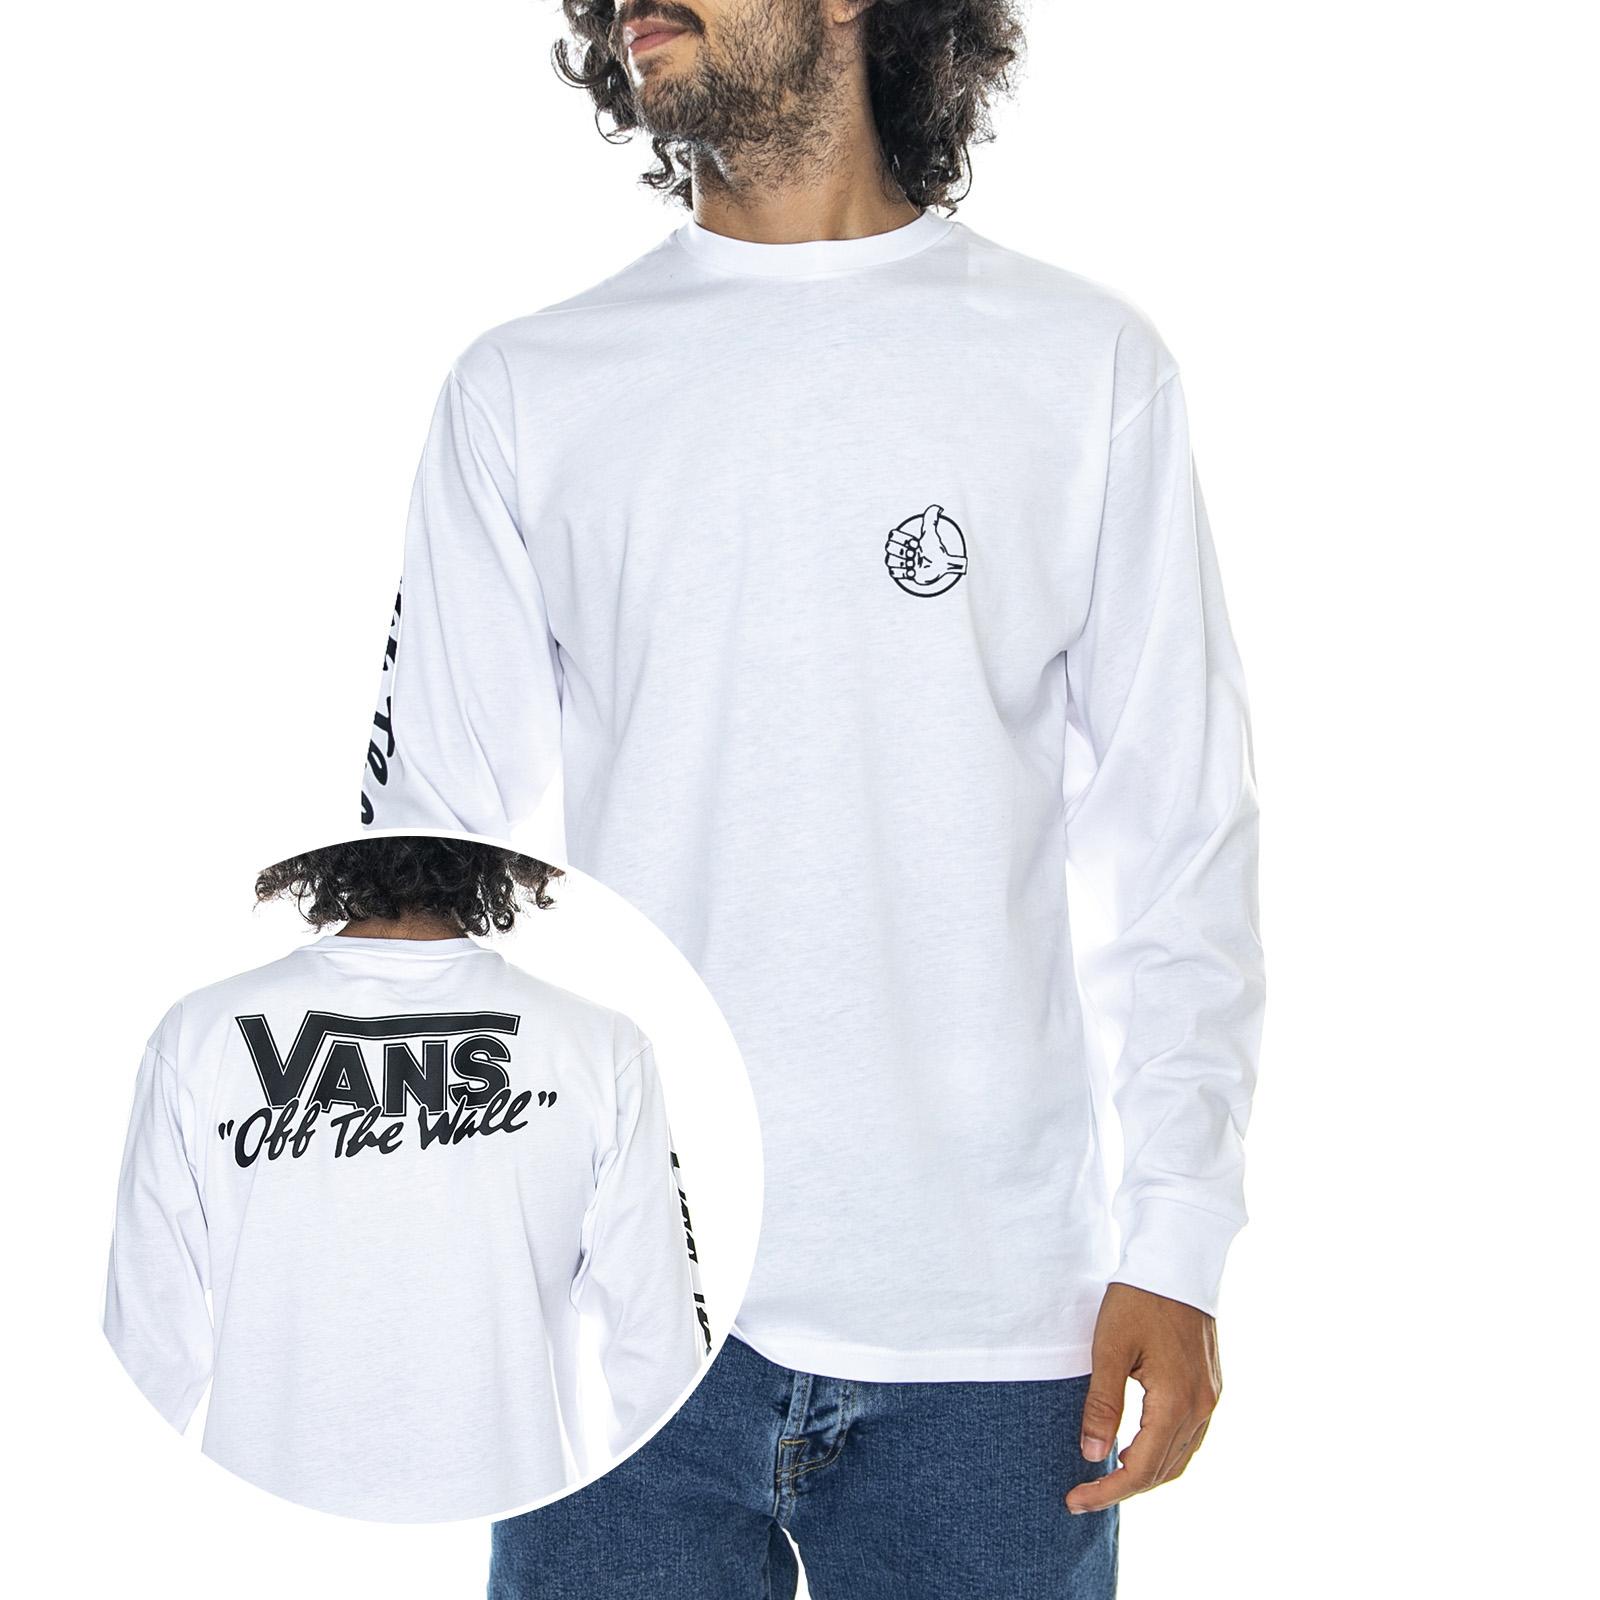 Dettagli su Vans Mn Bmx Off The Wall White Maglietta Maniche Lunghe Uomo Bianco